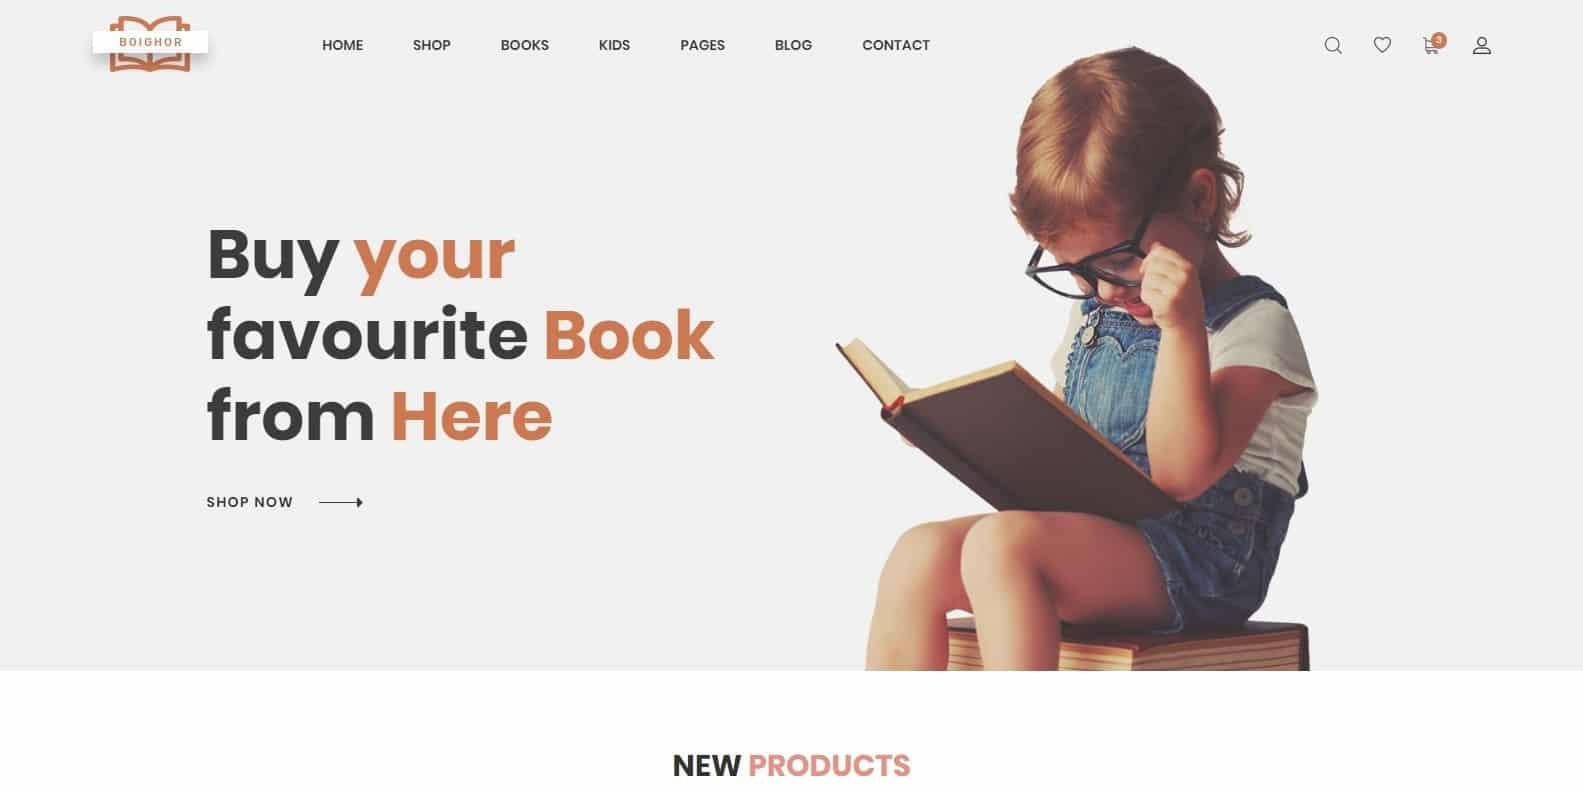 boighor-html-bookstore-website-template